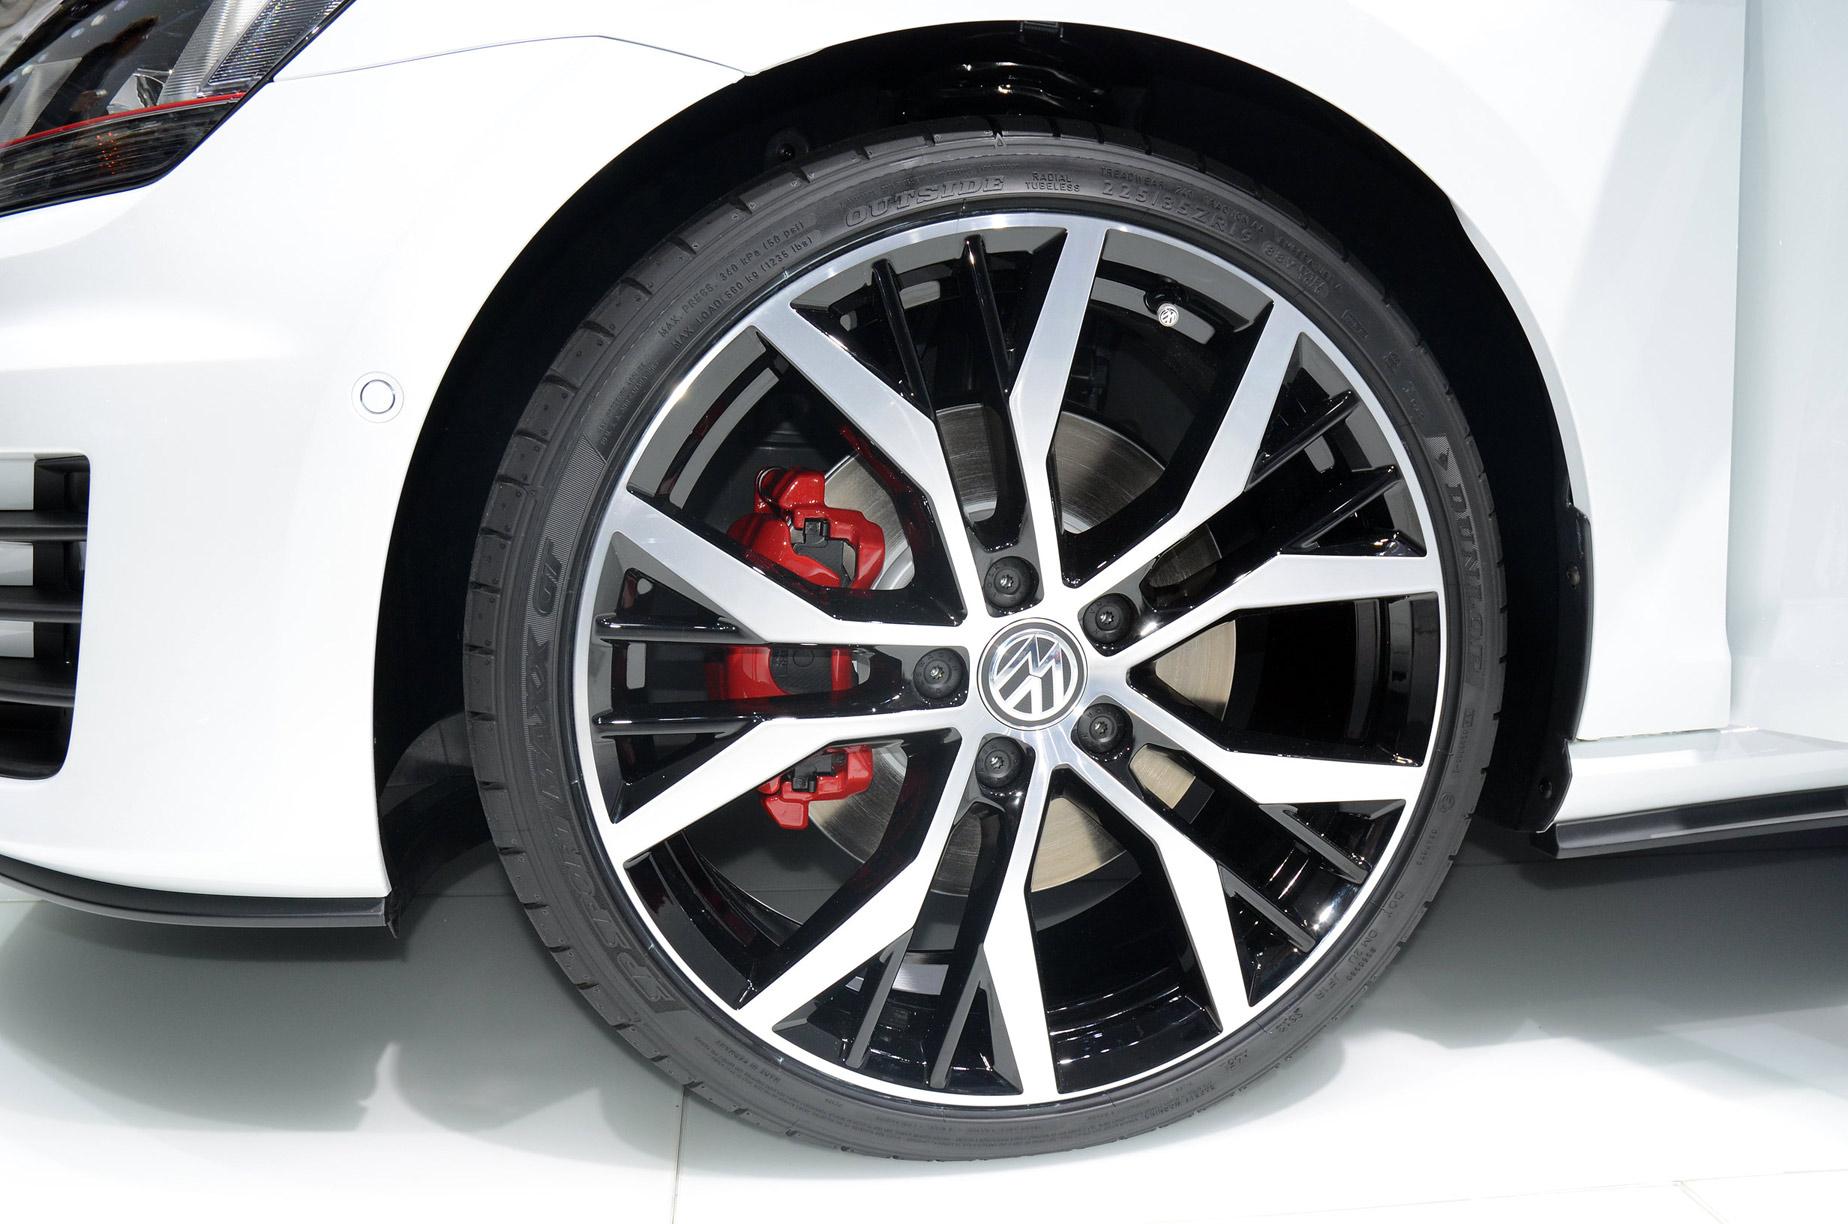 Audi R8 Test Mule